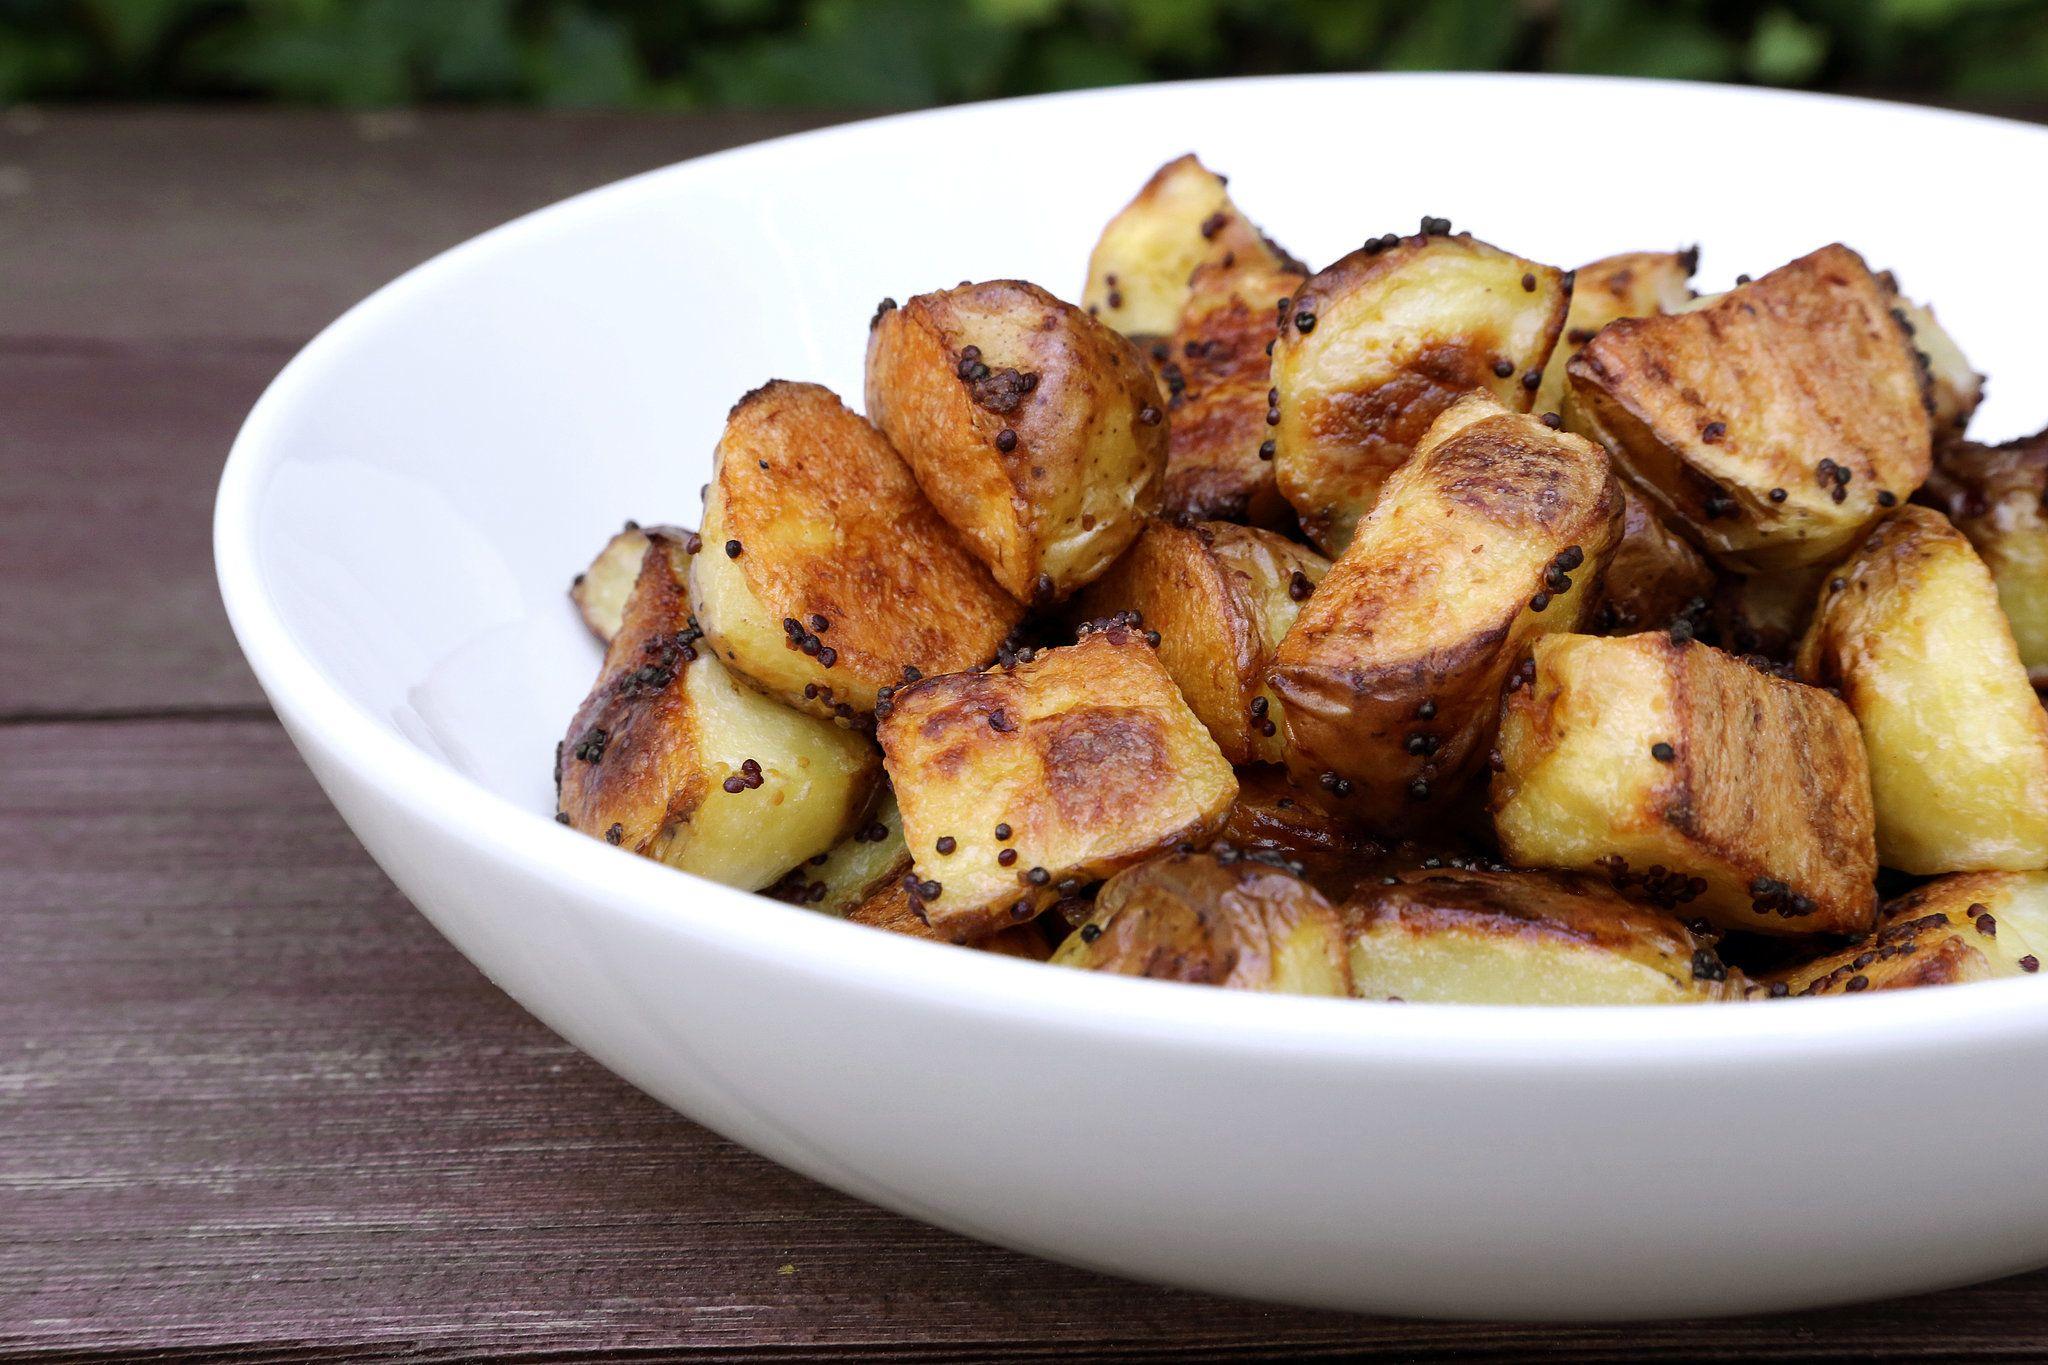 Rețeta de la mama - cum prepari cartofii copți crocanți?